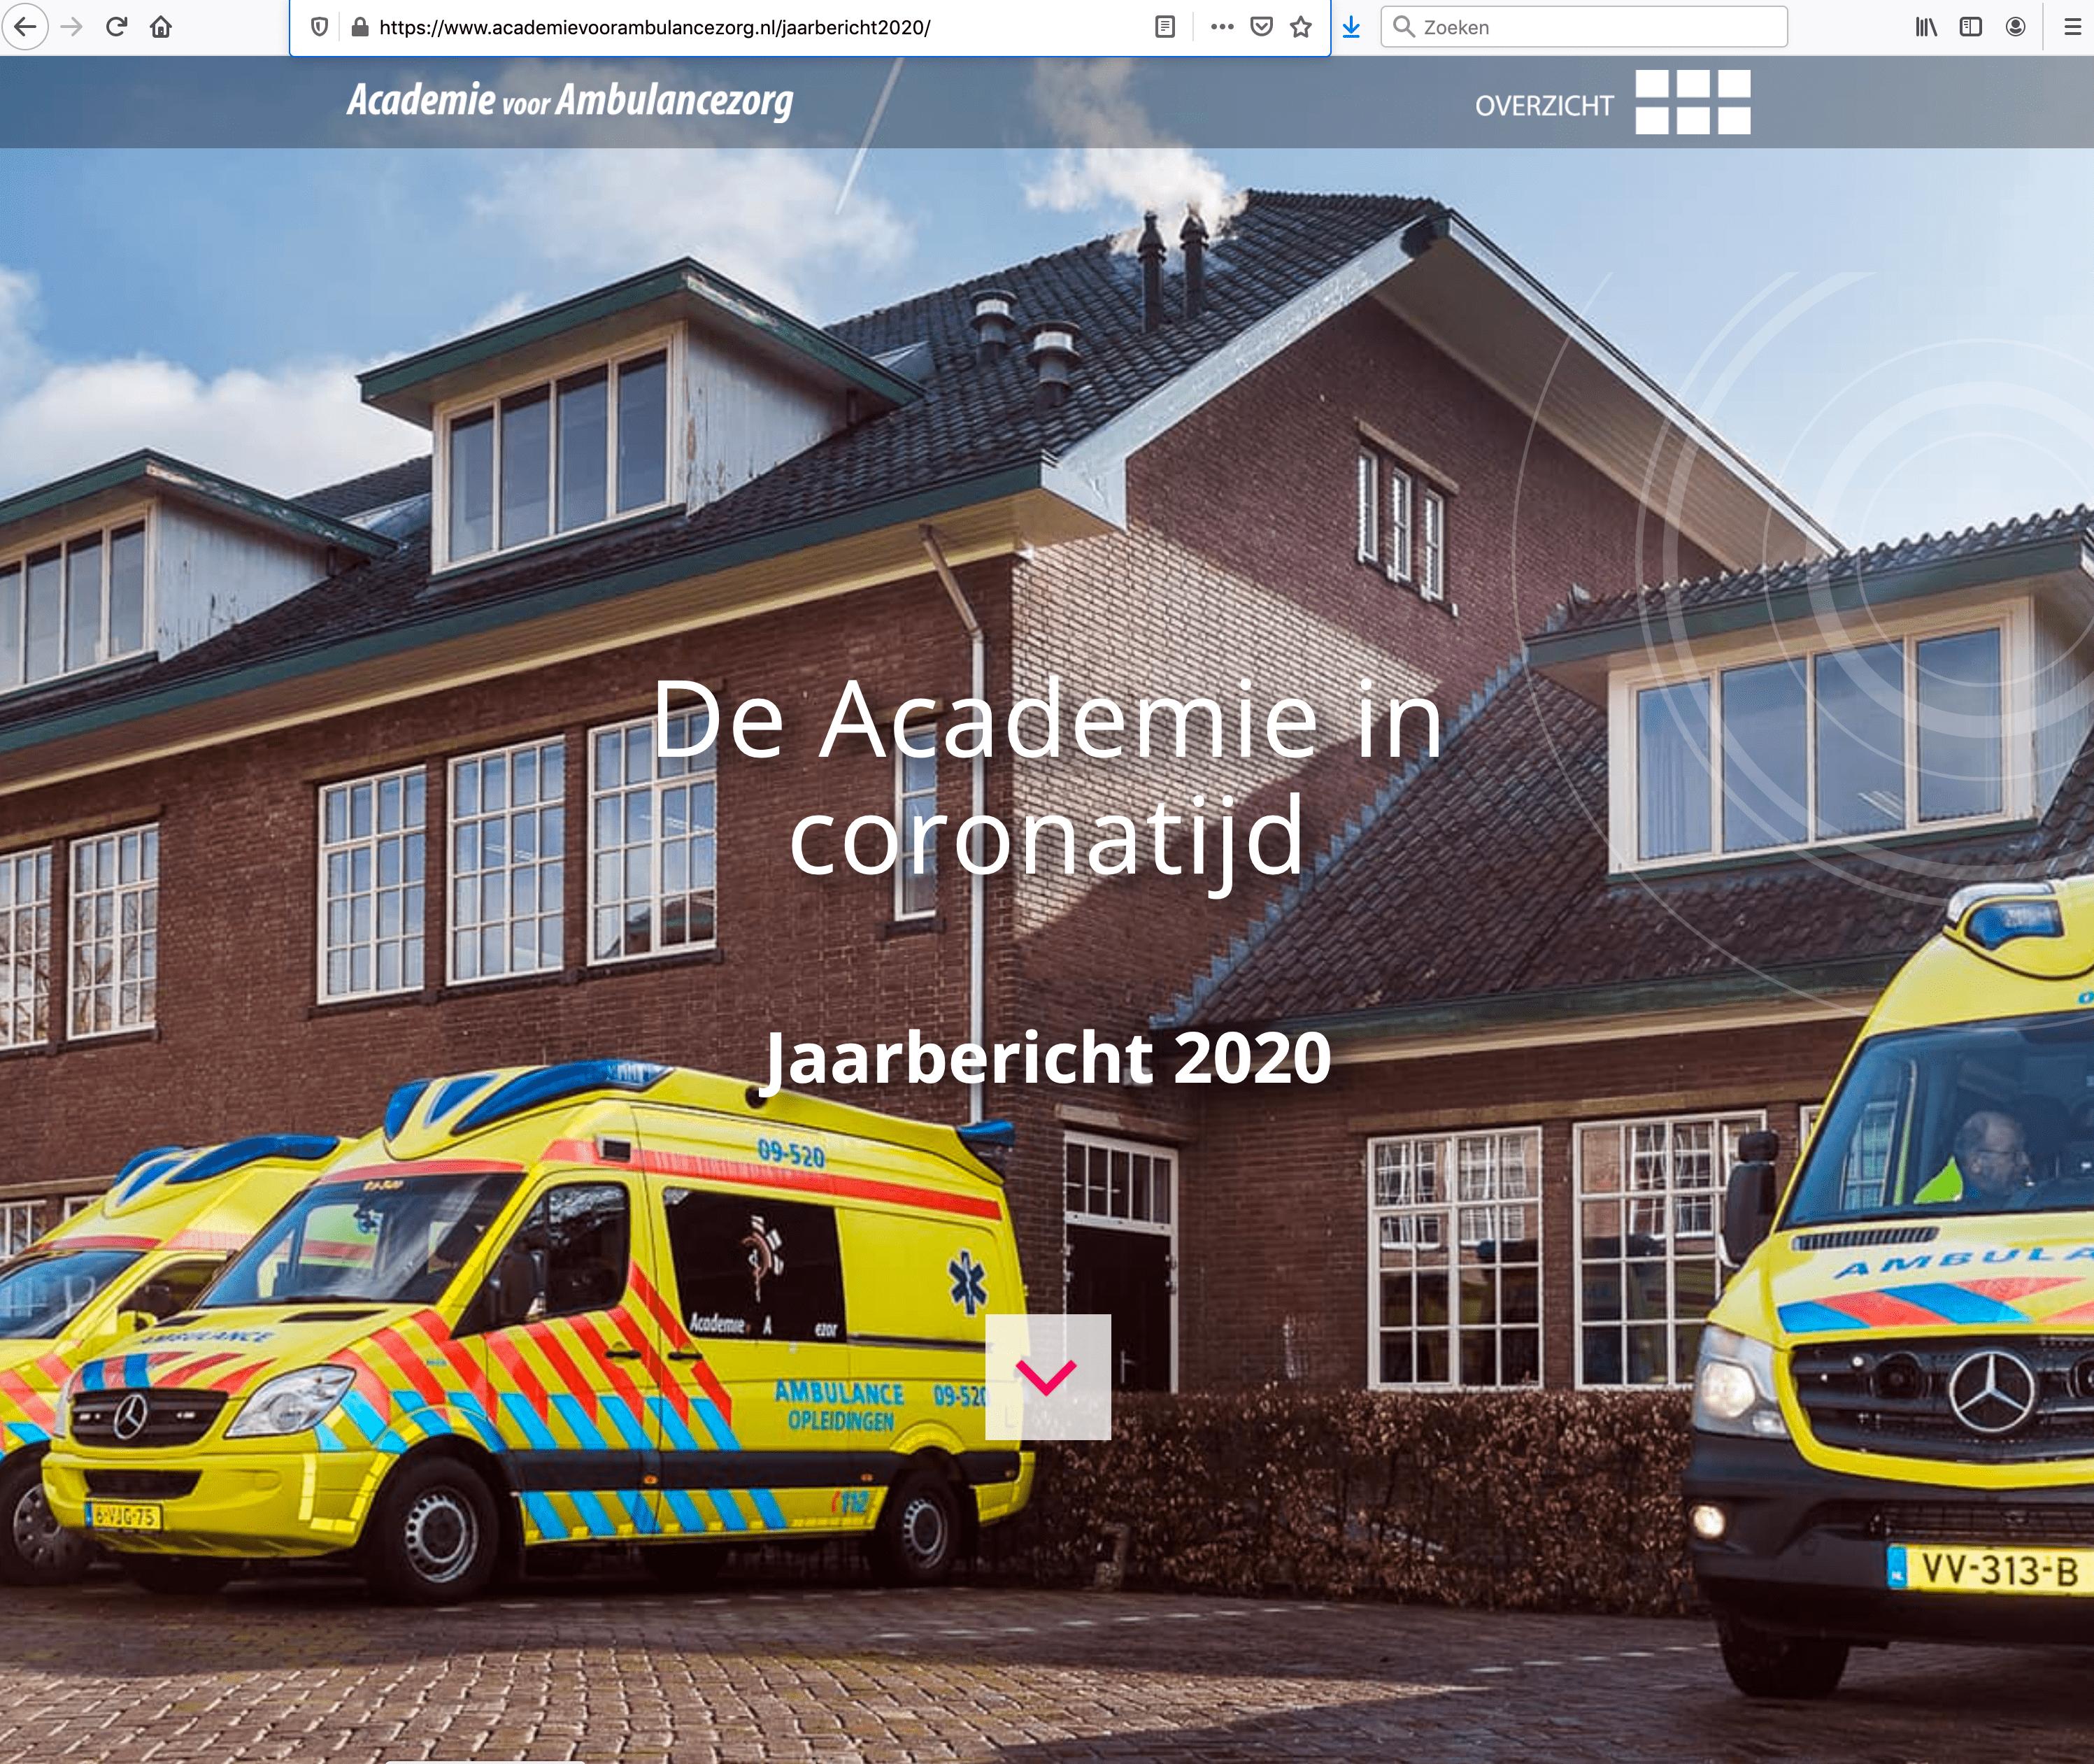 Jaarverslag Academie voor Ambulancezorg 2020